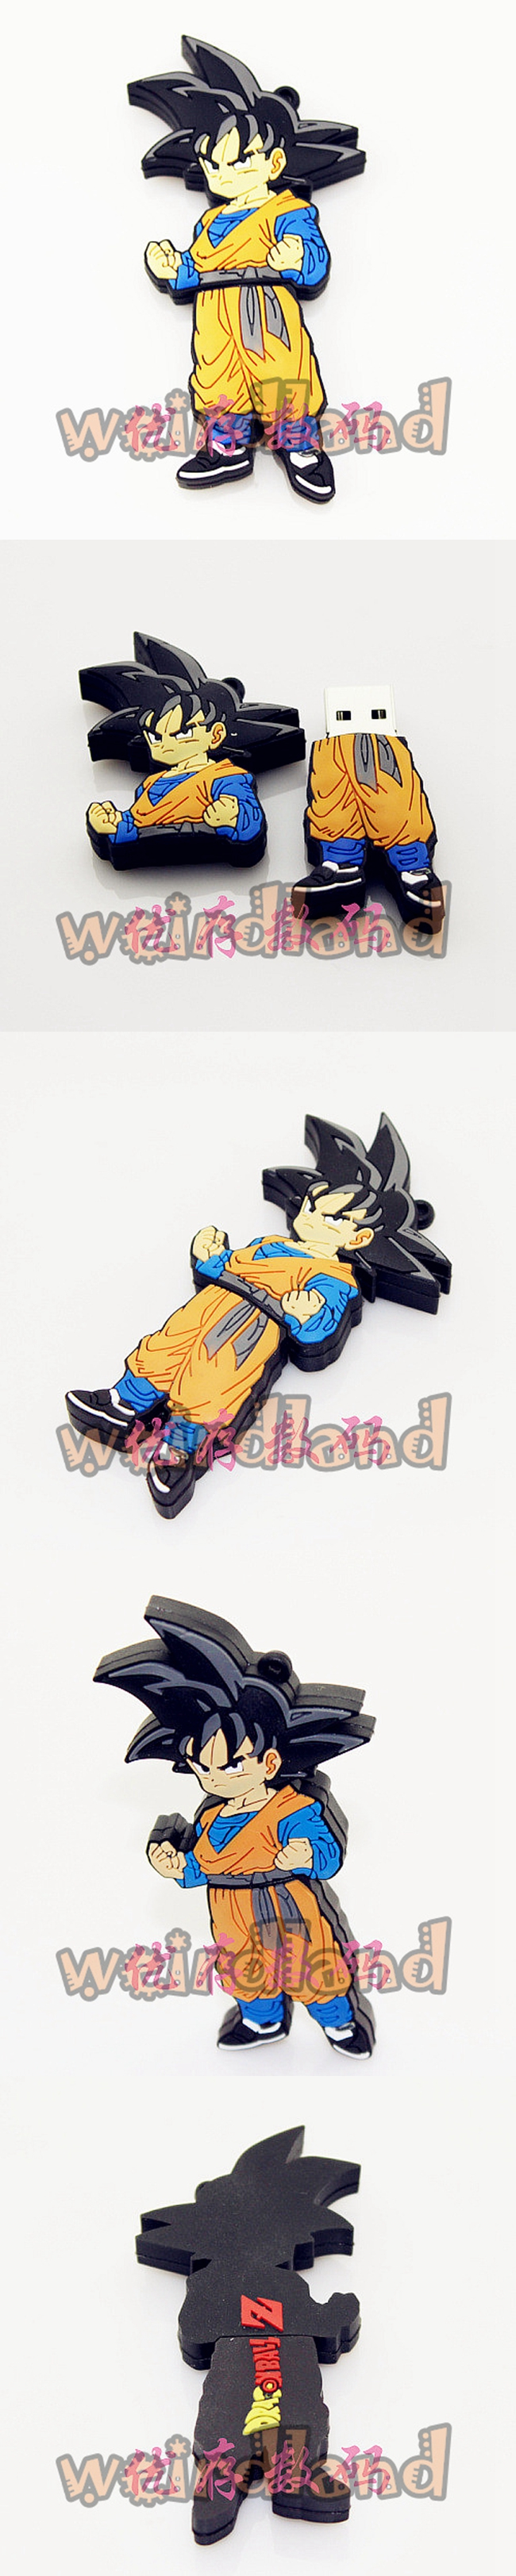 16GB Dragon Ball Quality USB Flash Drives WeirdLand Goku USB Stick